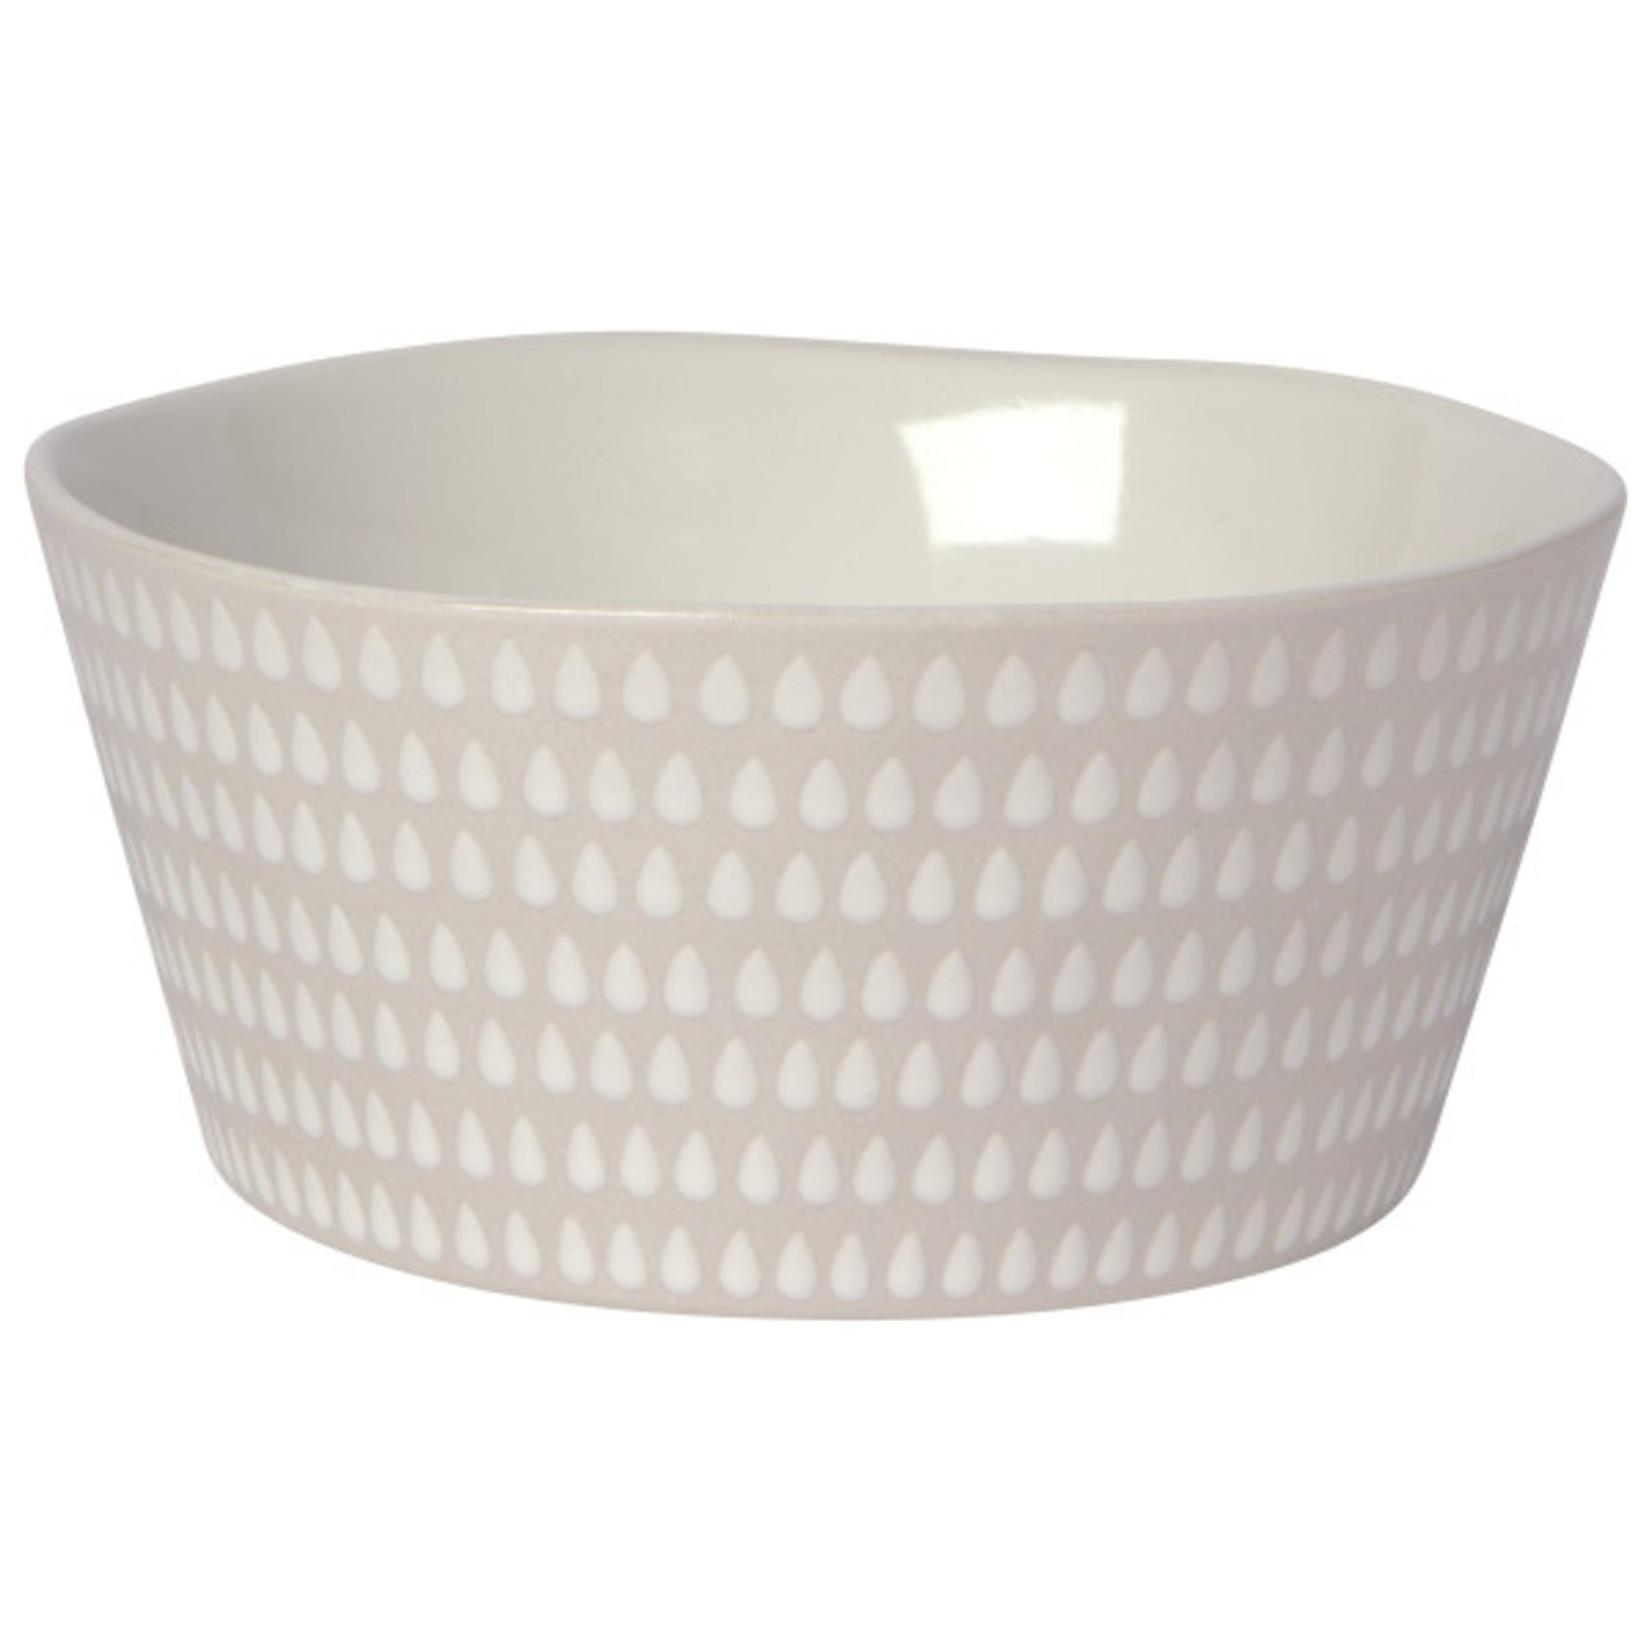 Heirloom Cloudburst Bowl